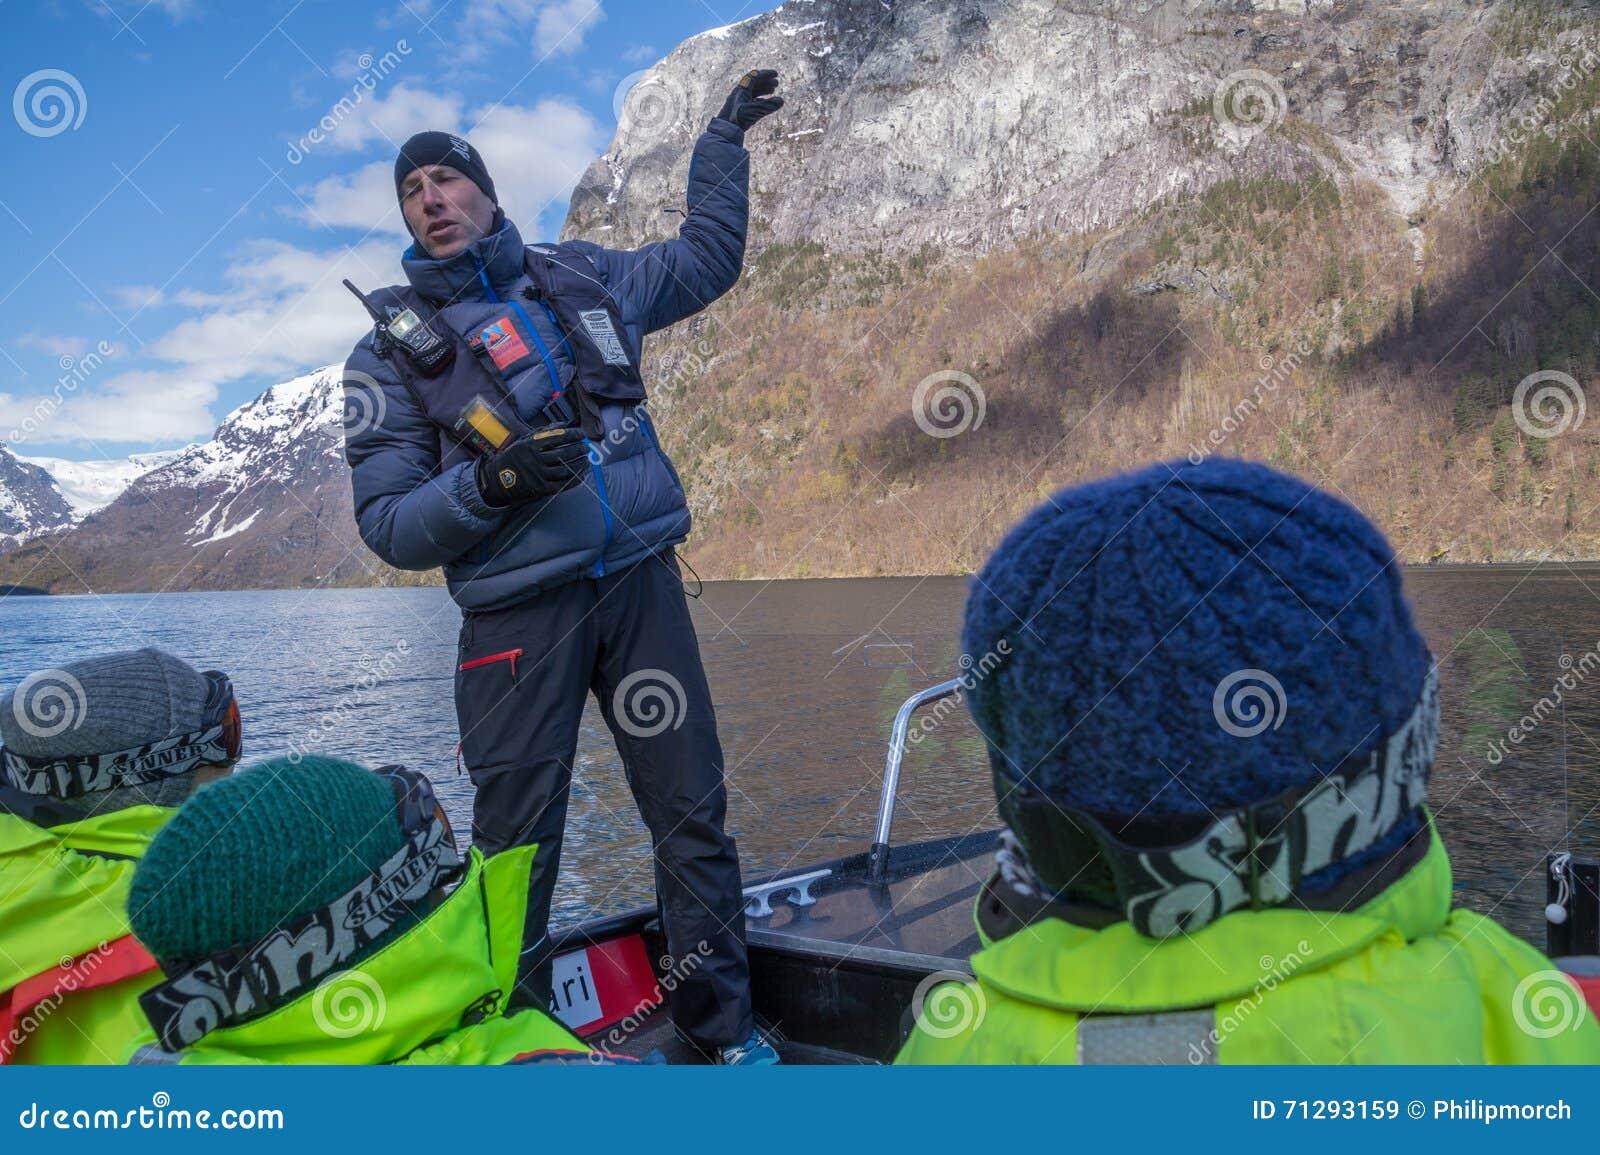 Rib boat operator explaining about the Norwegian fjords